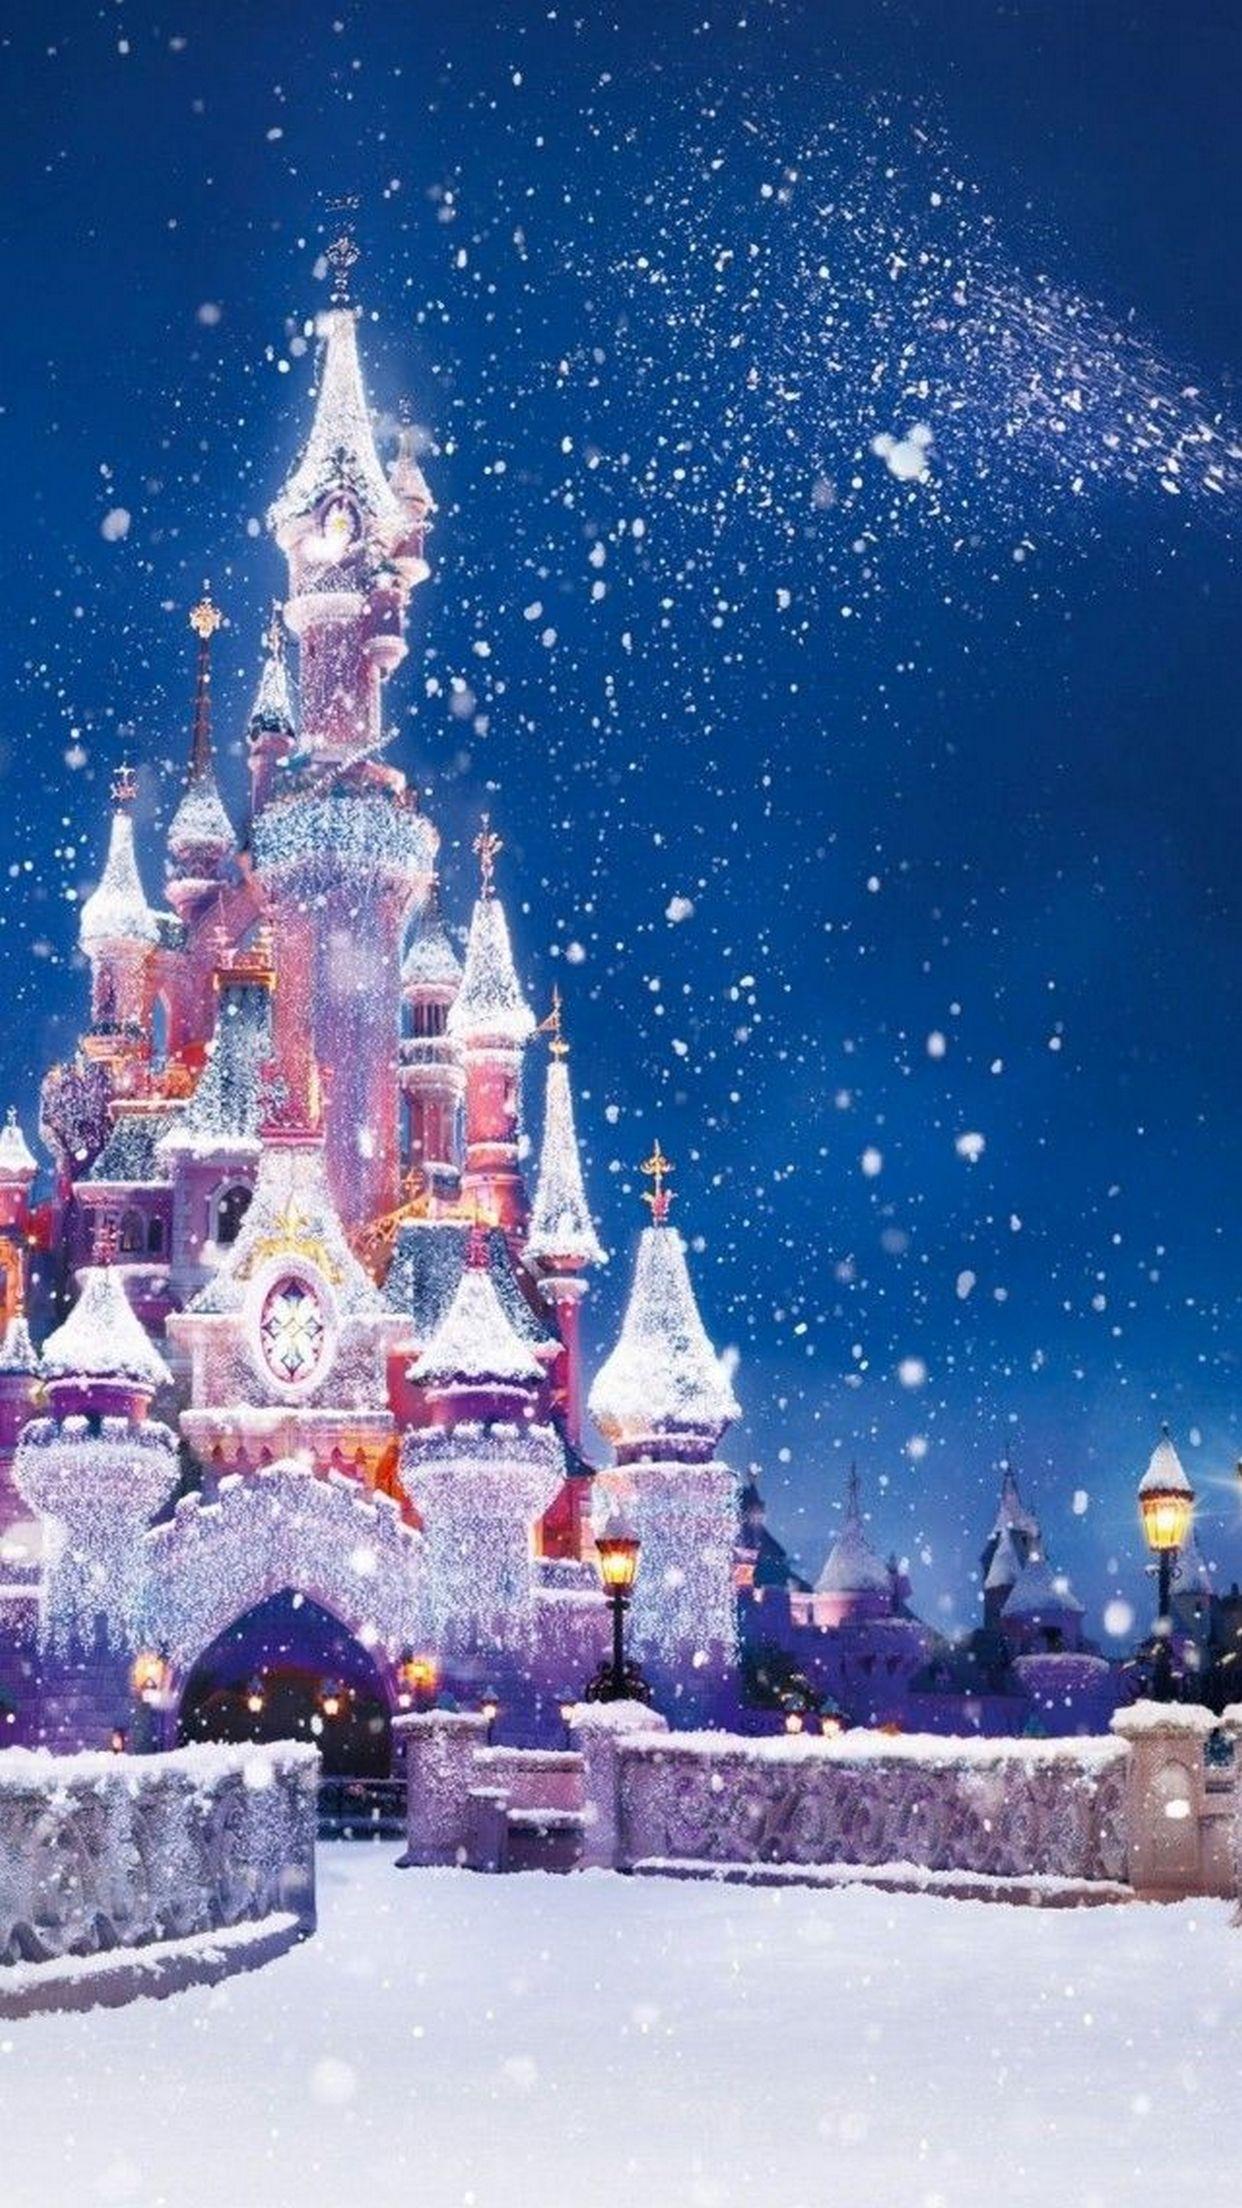 Https All Images Net Wallpaper Iphone Disney 79 Wallpaper Iphone Disney 79 Wallpaper Iphone Christmas Winter Backgrounds Iphone Wallpaper Iphone Disney